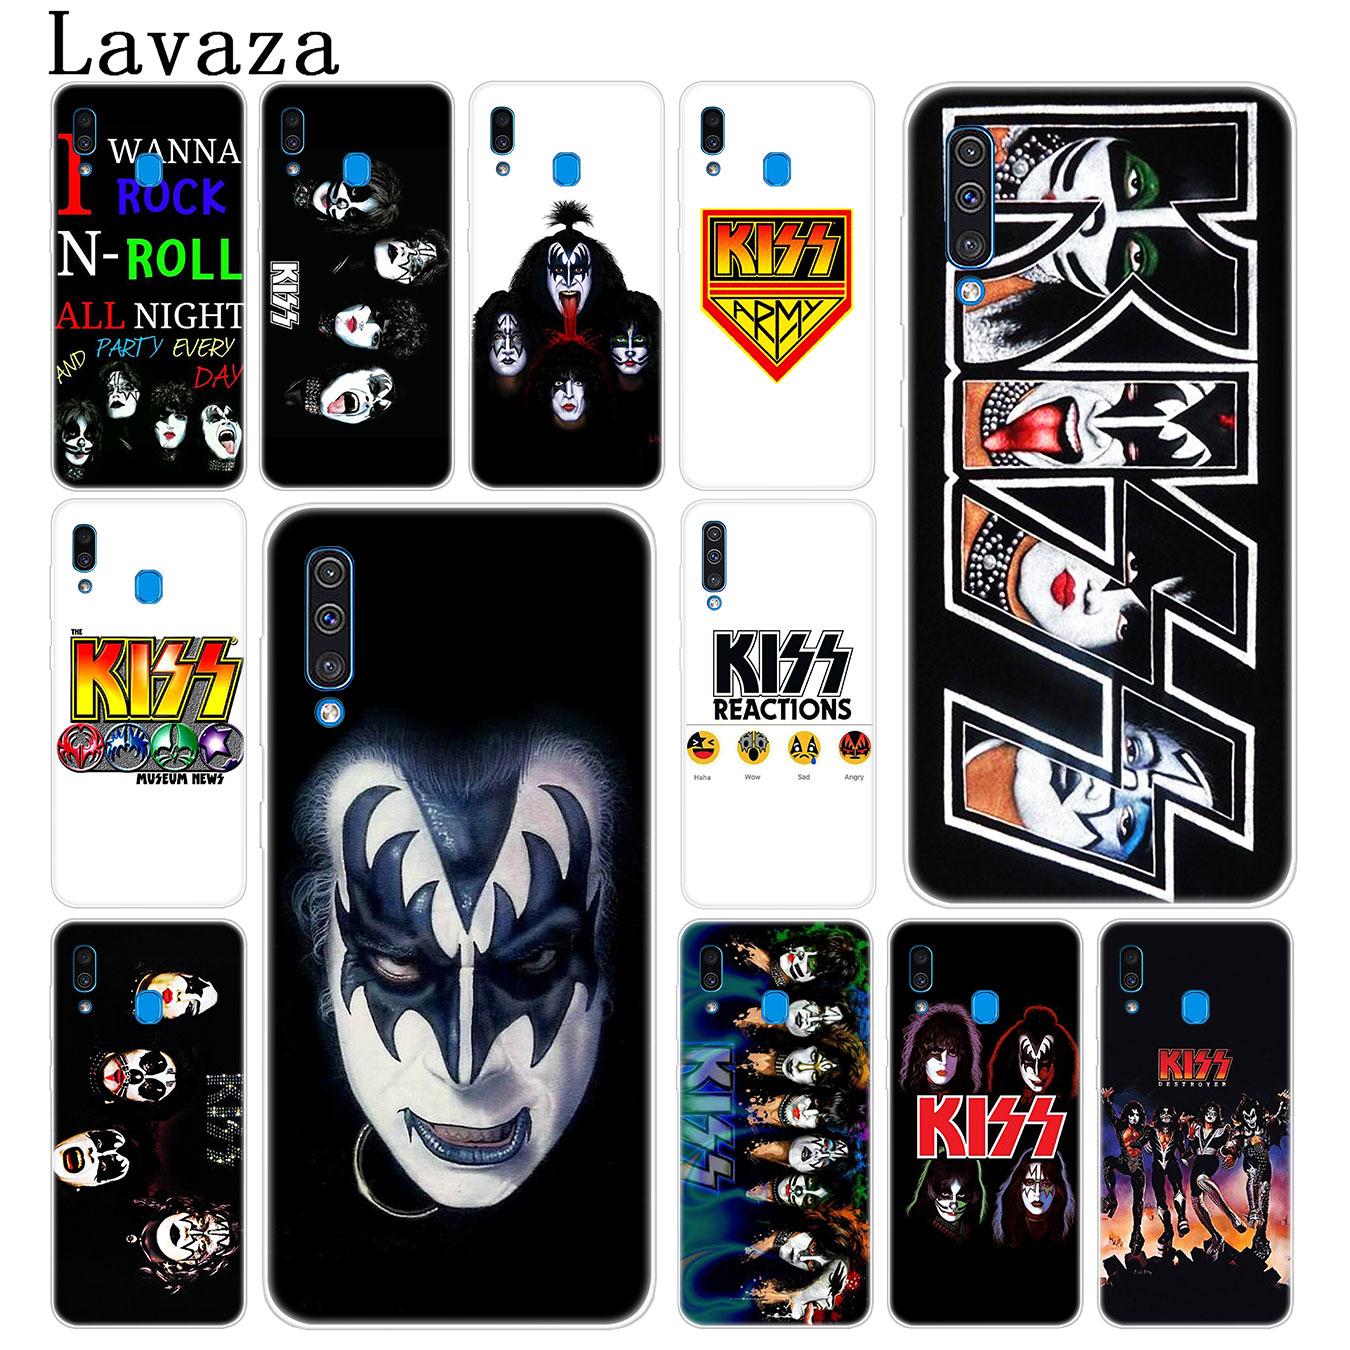 Lavaza Gen Simmons Kuss band Harte Telefon Fall für Samsung Galaxy A70 A60 A50 A40 A30 A20 A10 M10 M20 m30 M40 A20e Abdeckung